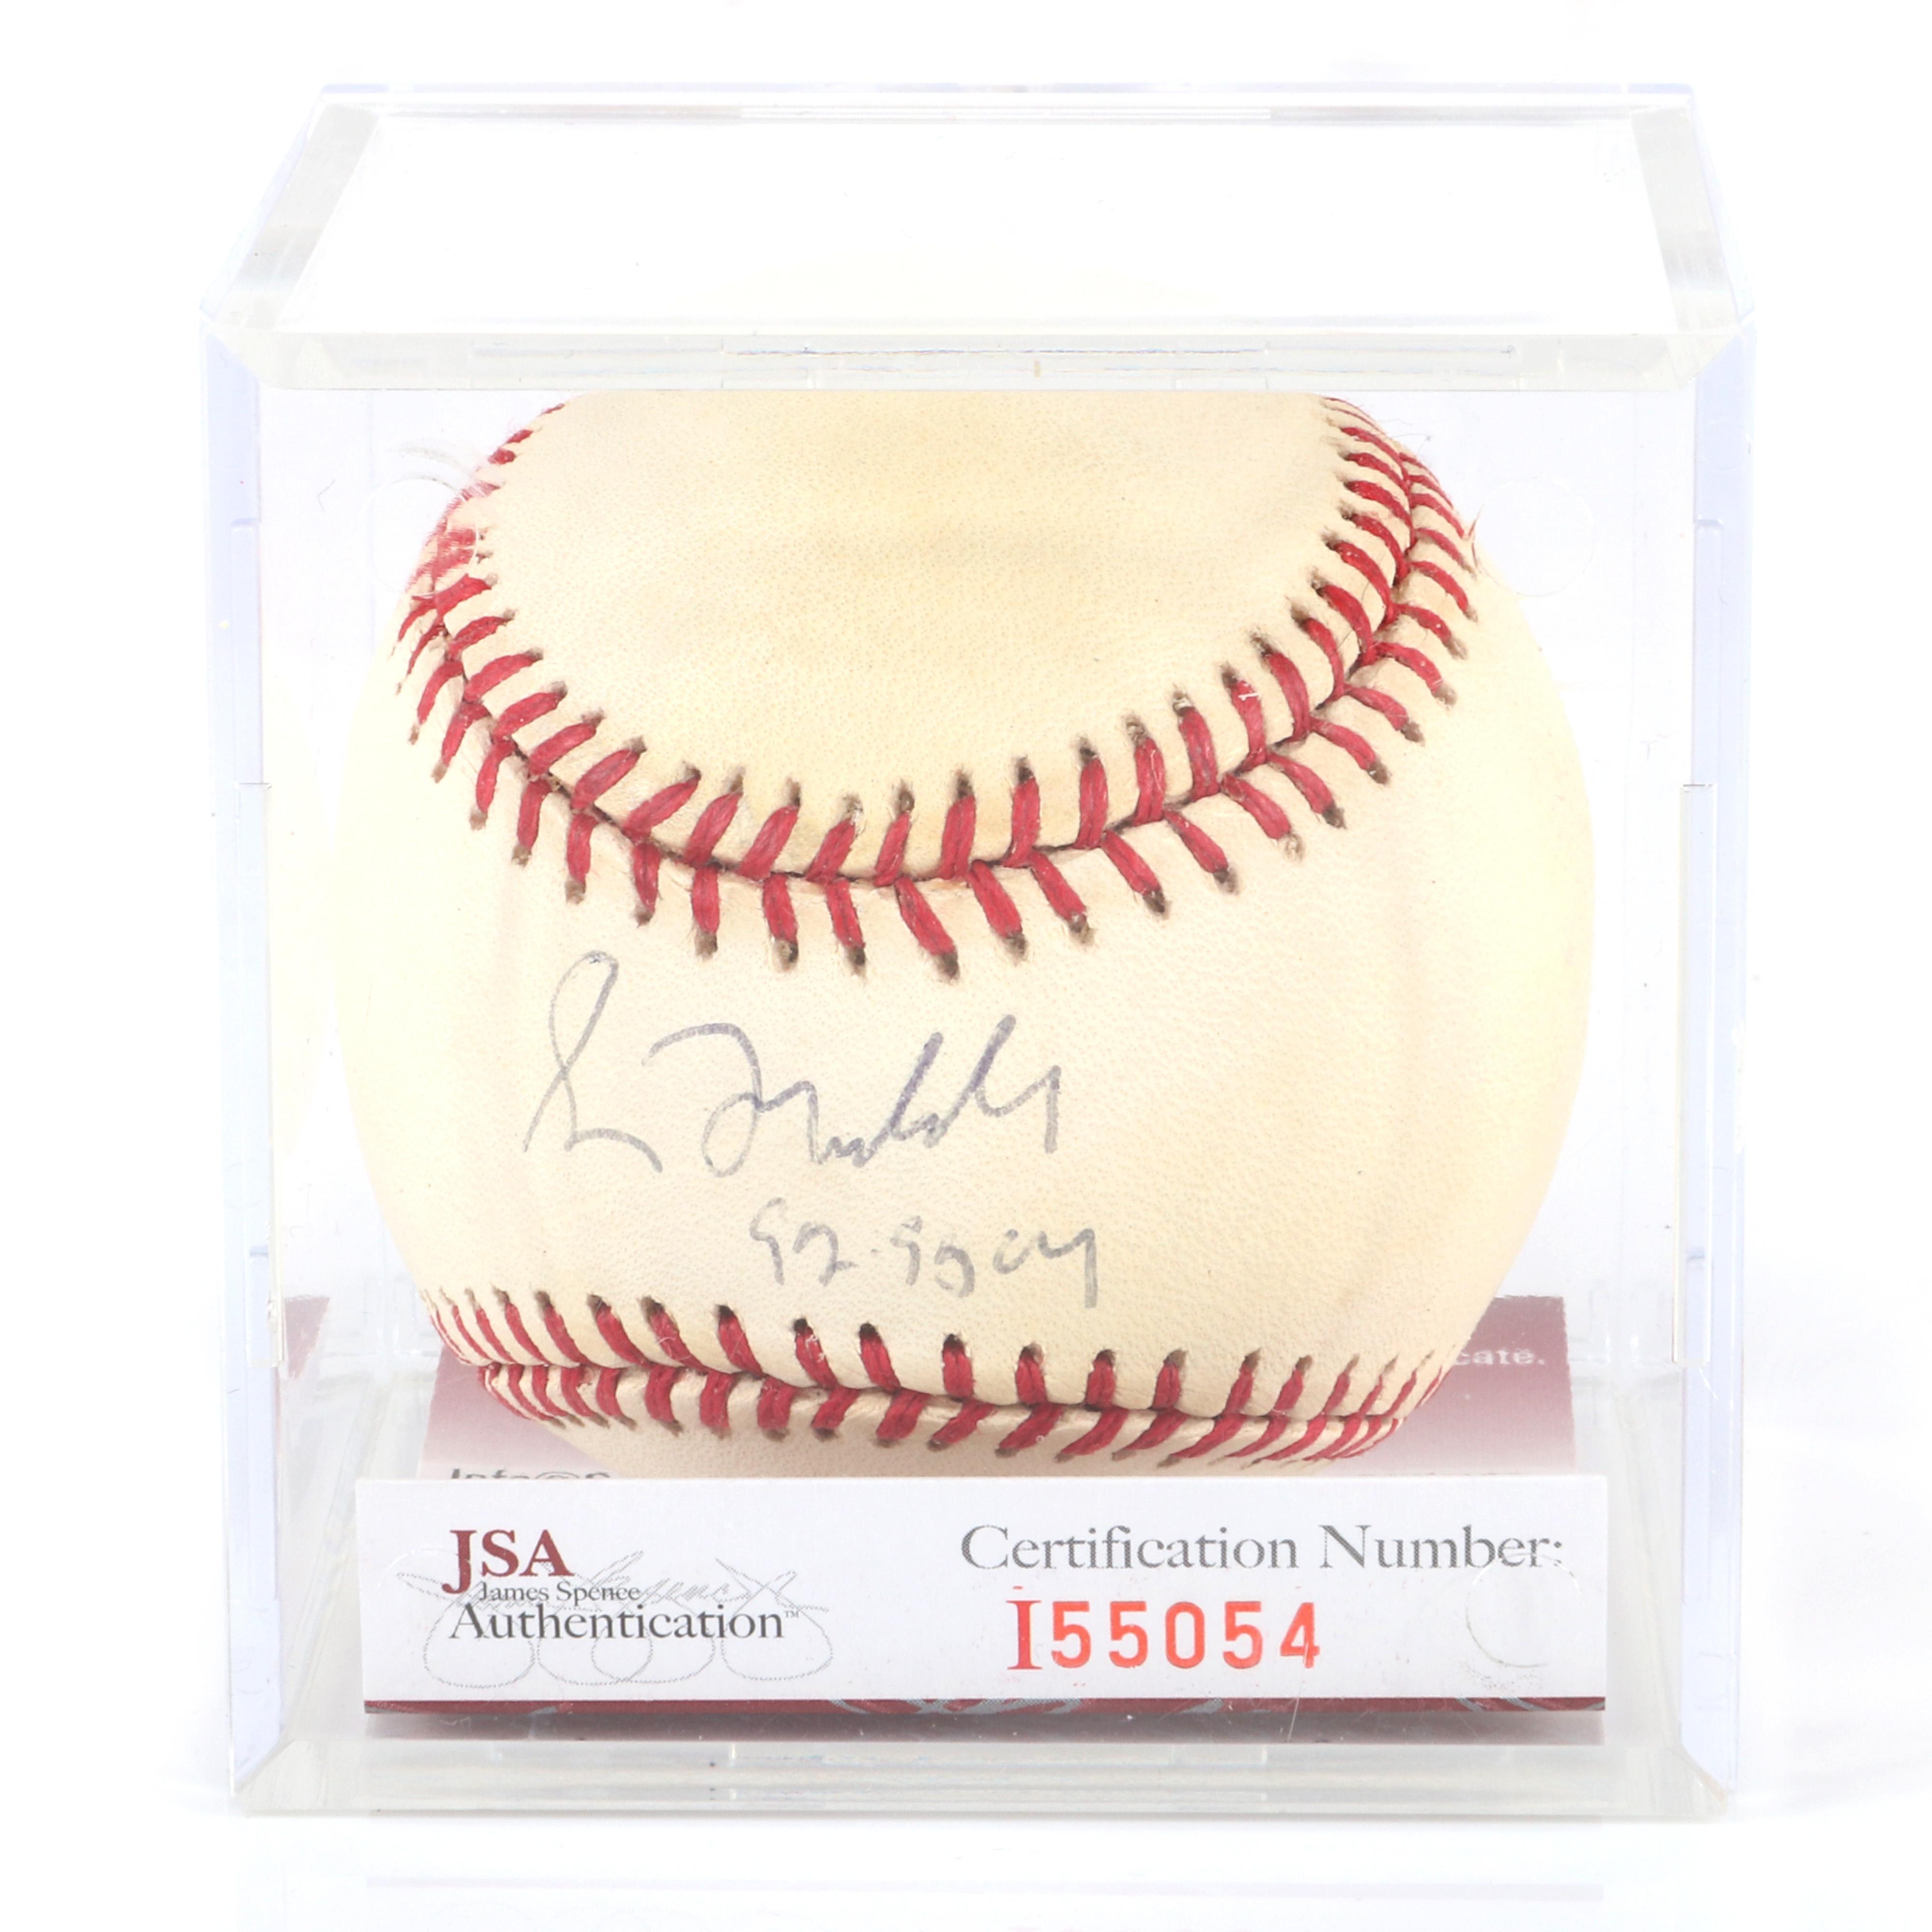 Greg Maddux Autographed Baseball